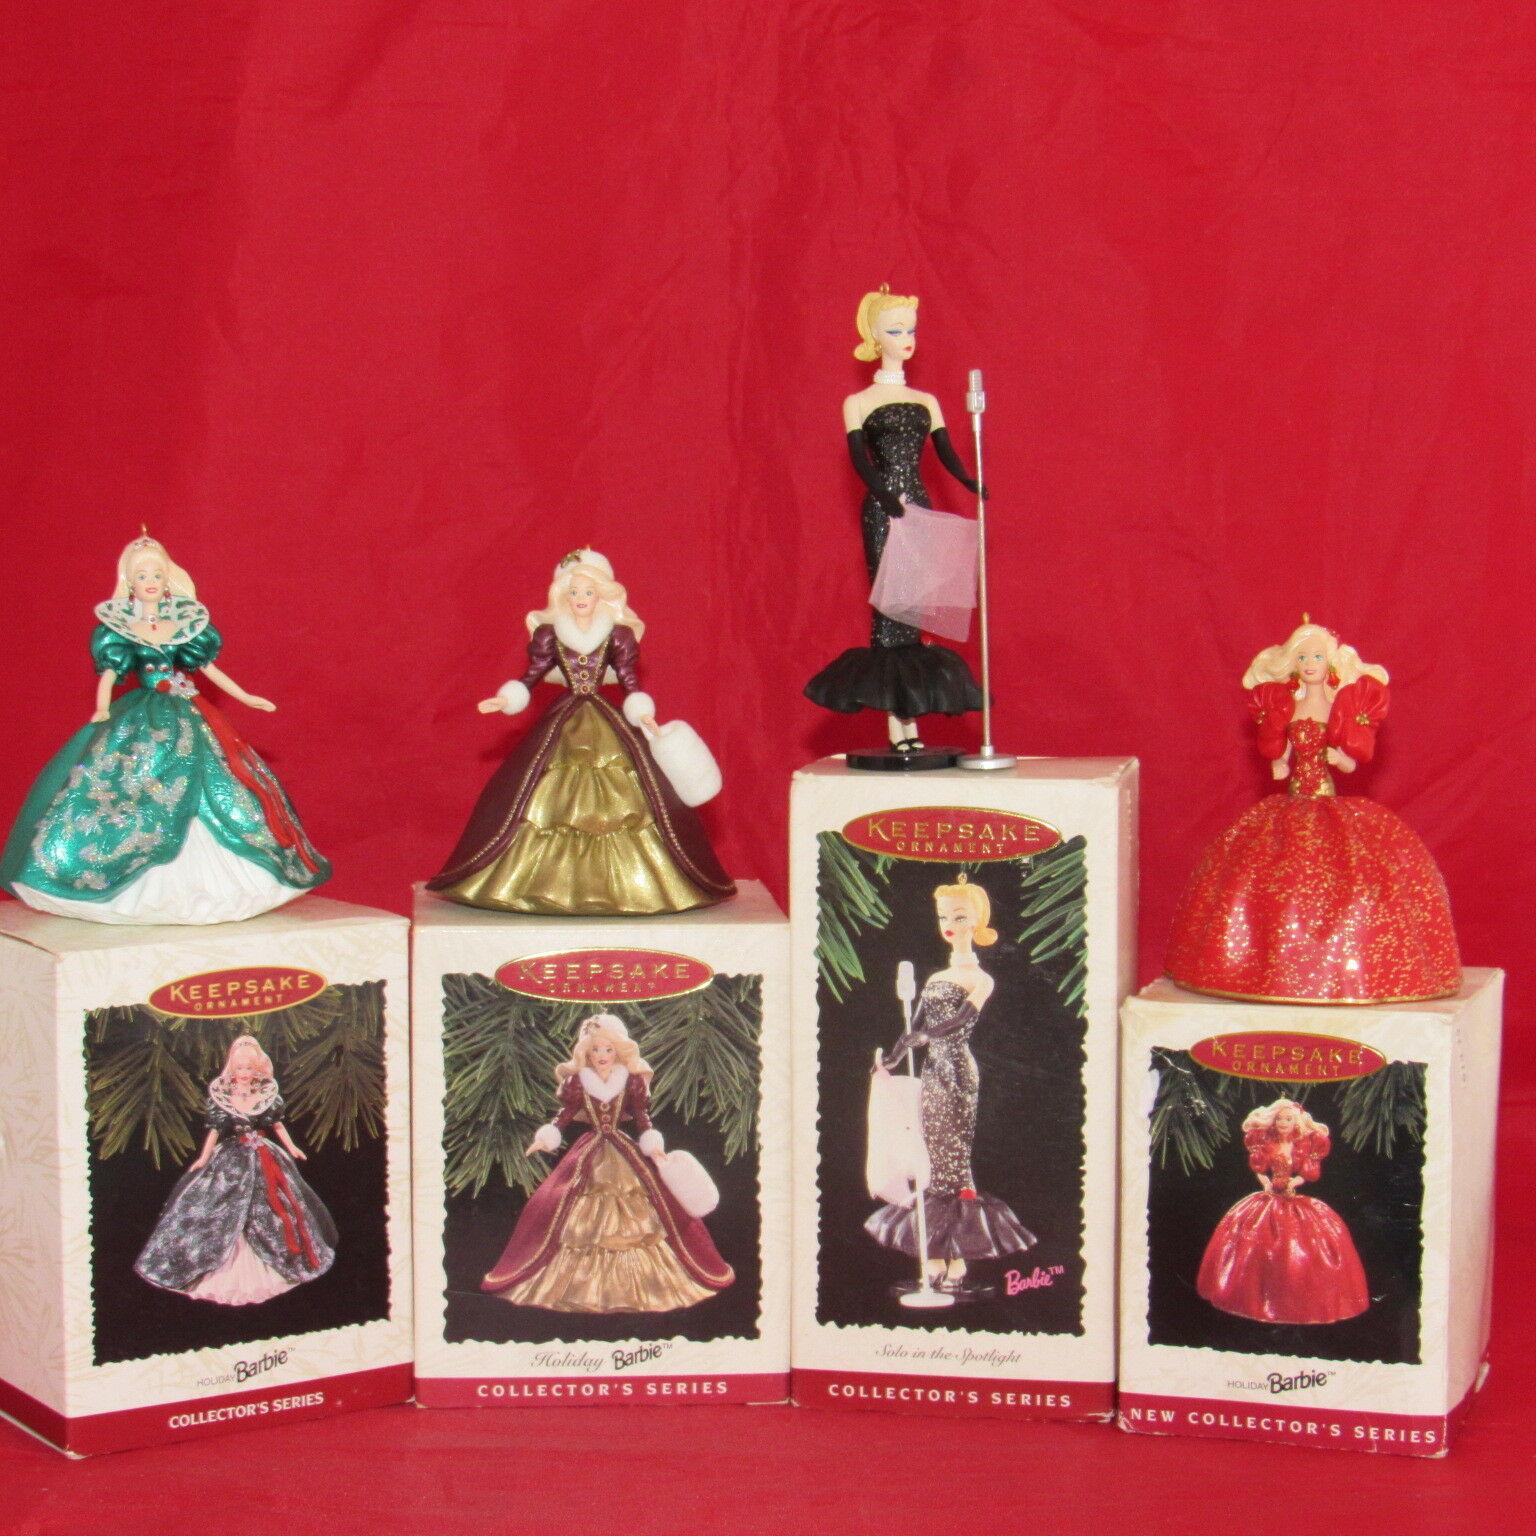 Barbie Christmas Ornament.Barbie Christmas Ornaments Hallmark Keepsake And 50 Similar Items